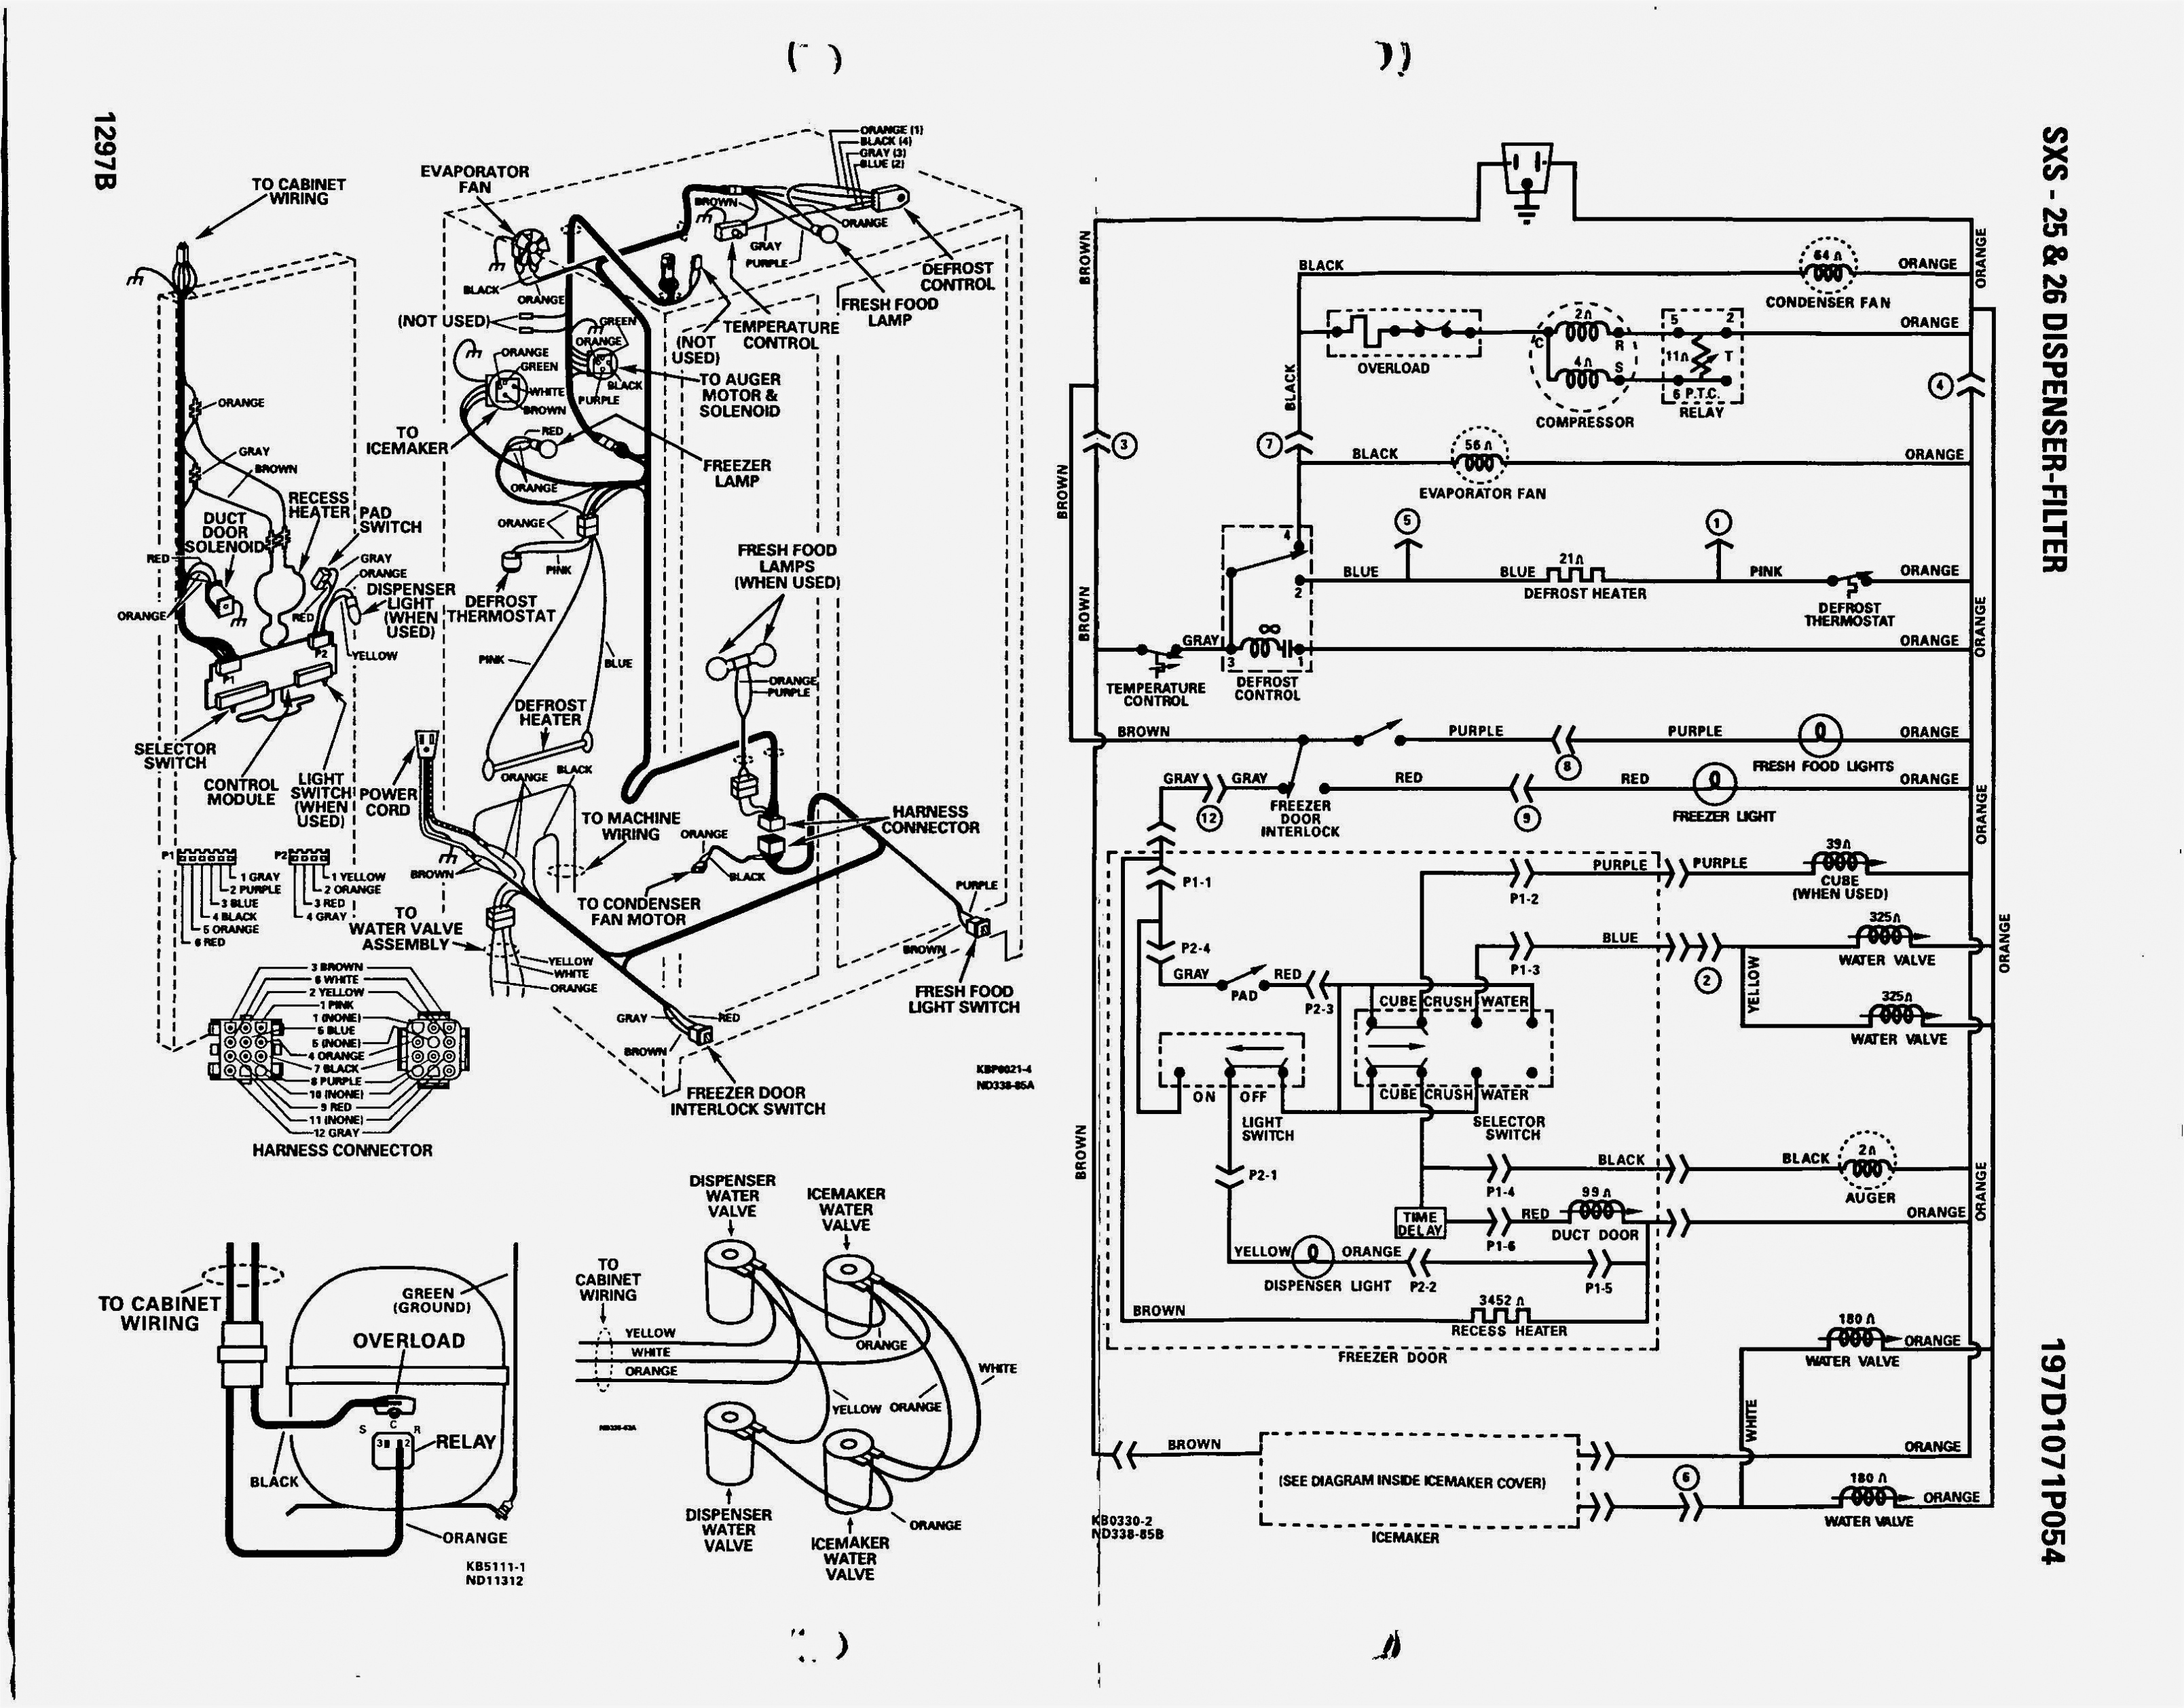 Single Phase Submersible Pump Wiring Diagram Inspirational